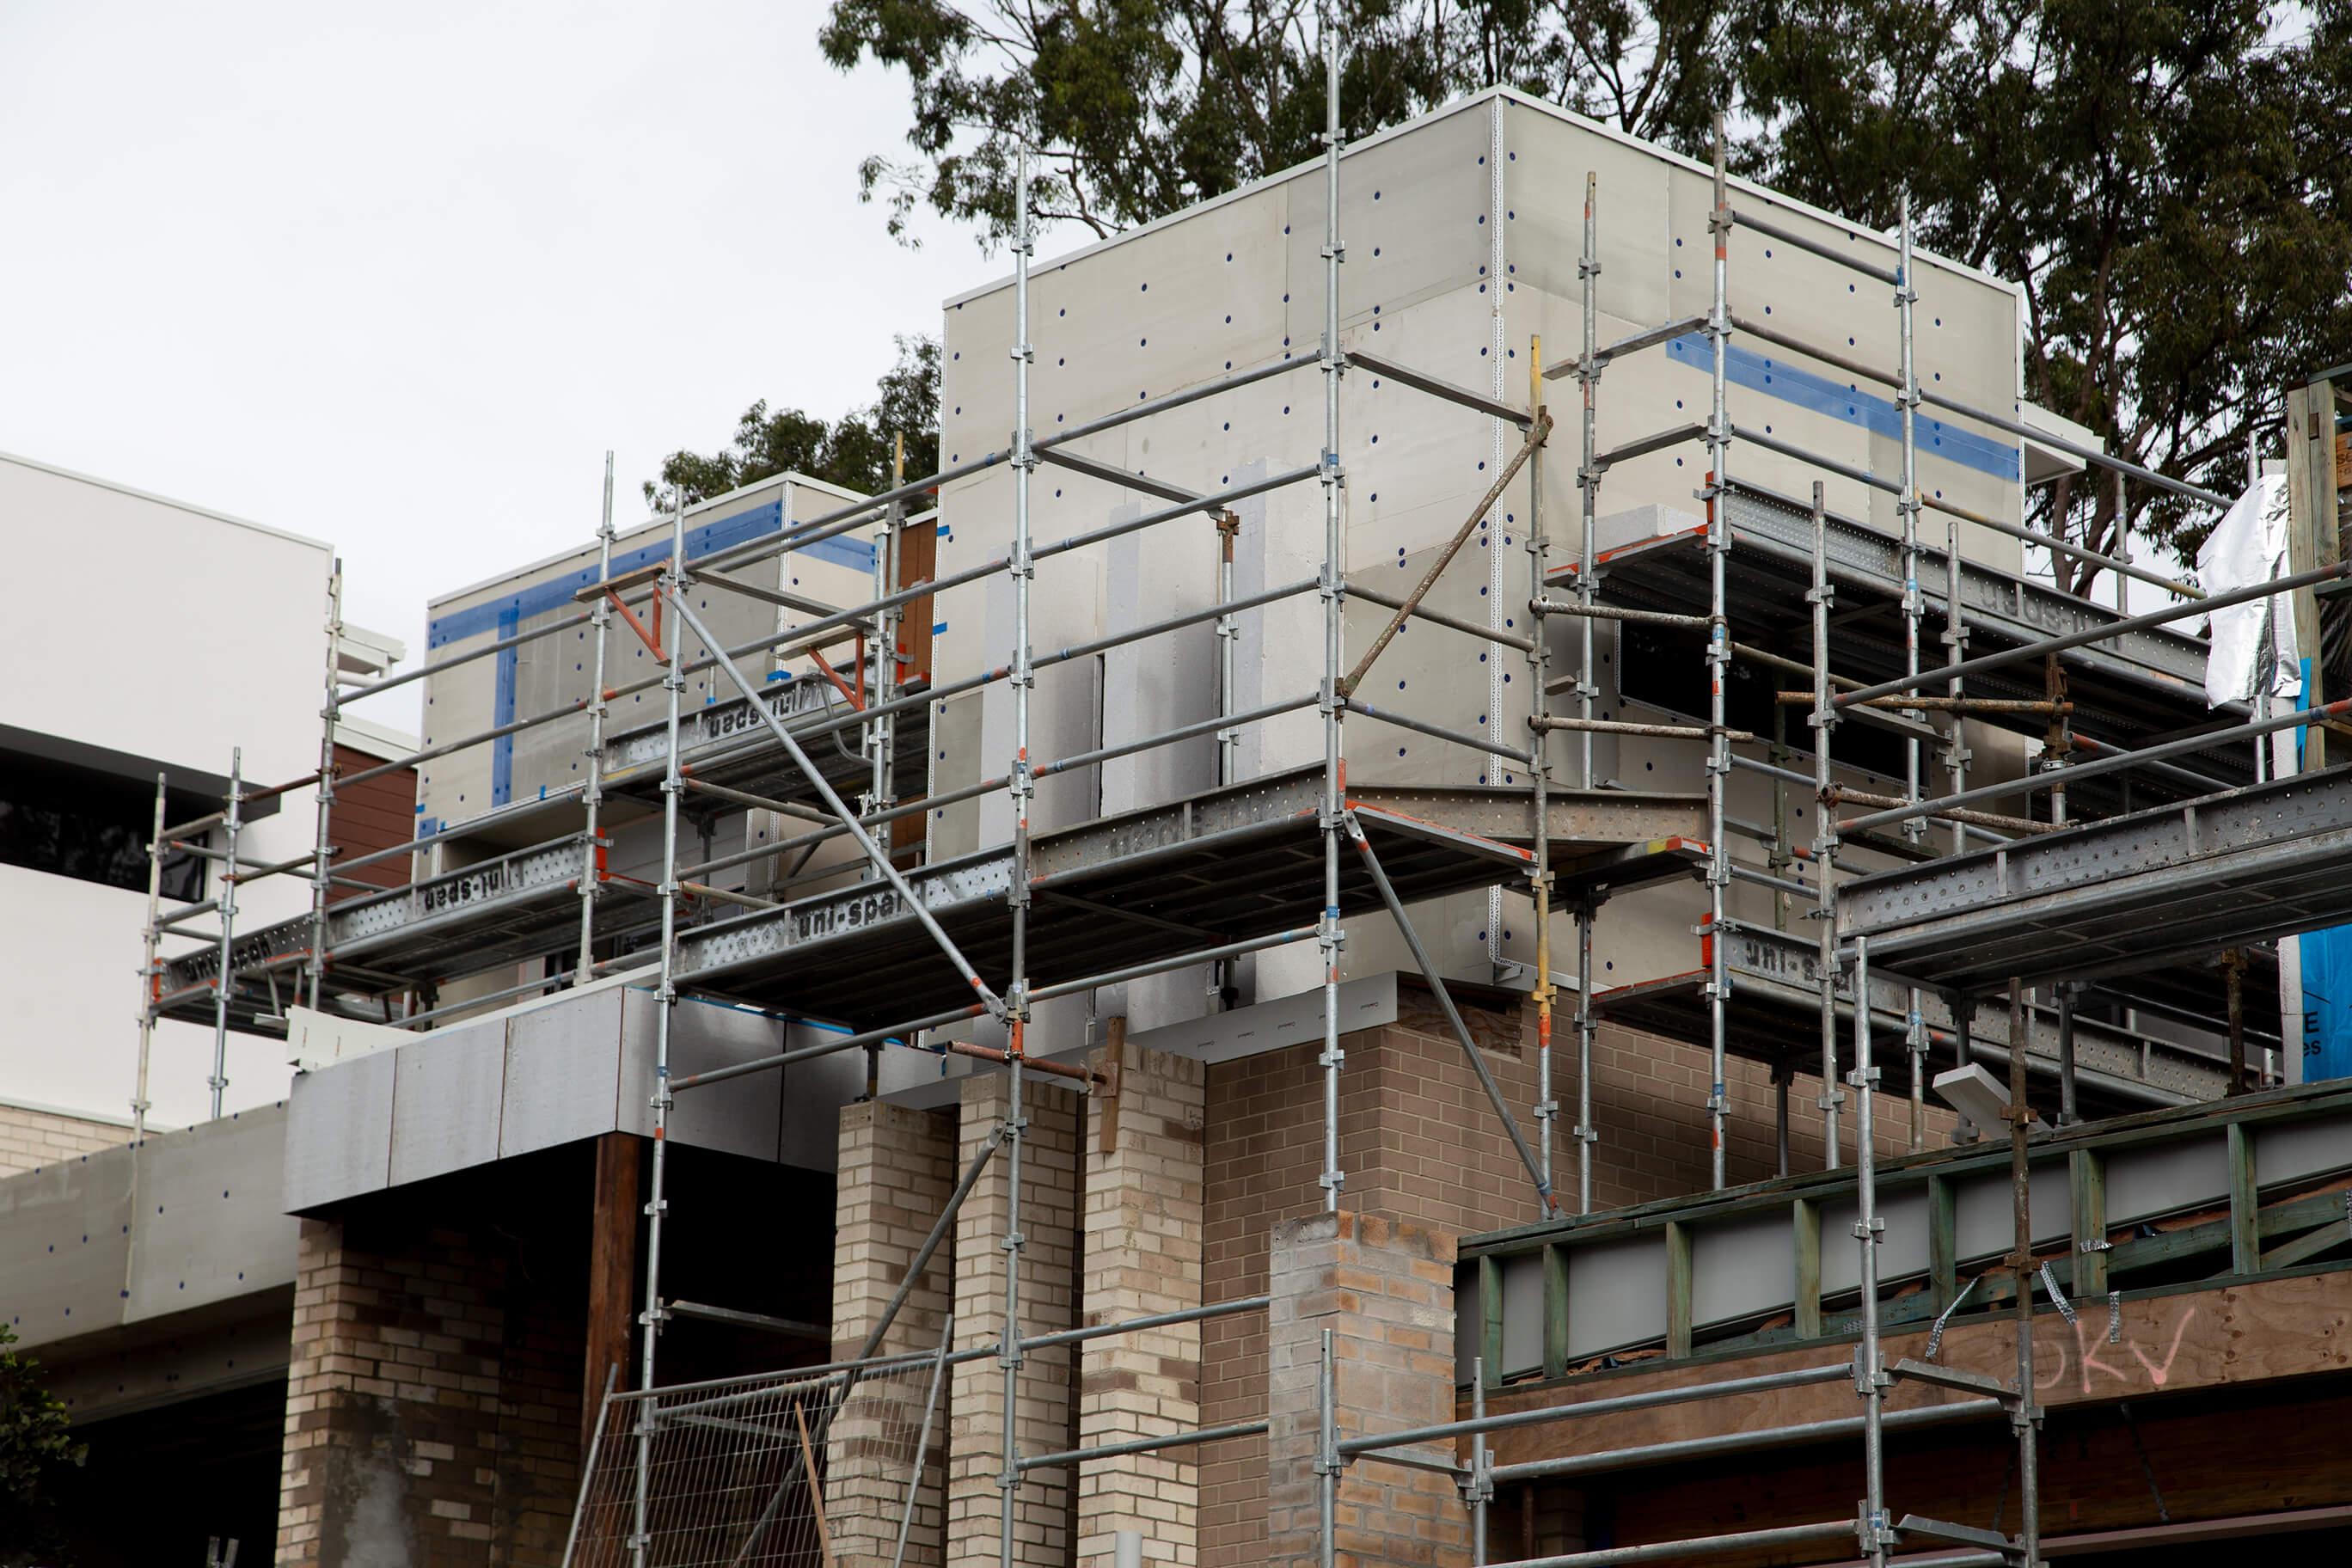 Custom-designed townhouse development in Carindale Brisbane